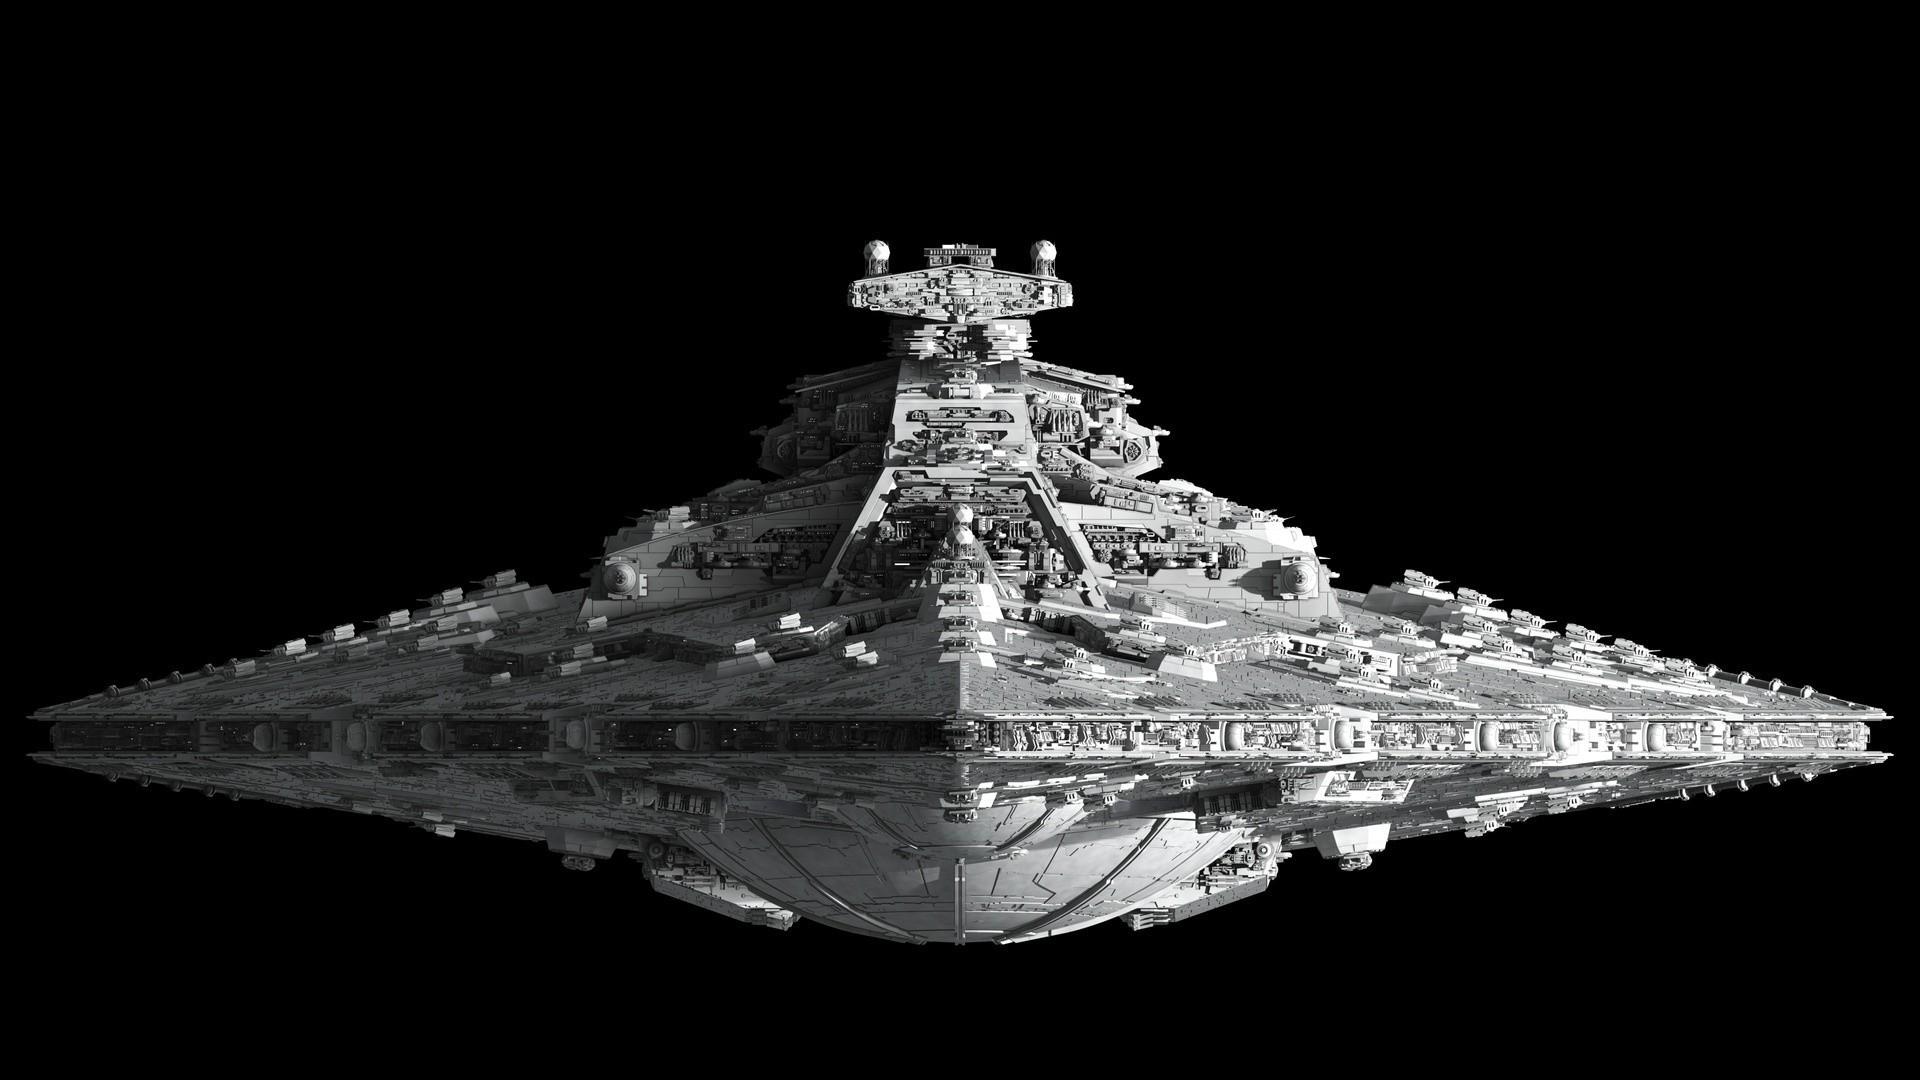 Star Wars, Star Destroyer Wallpapers HD / Desktop and Mobile Backgrounds